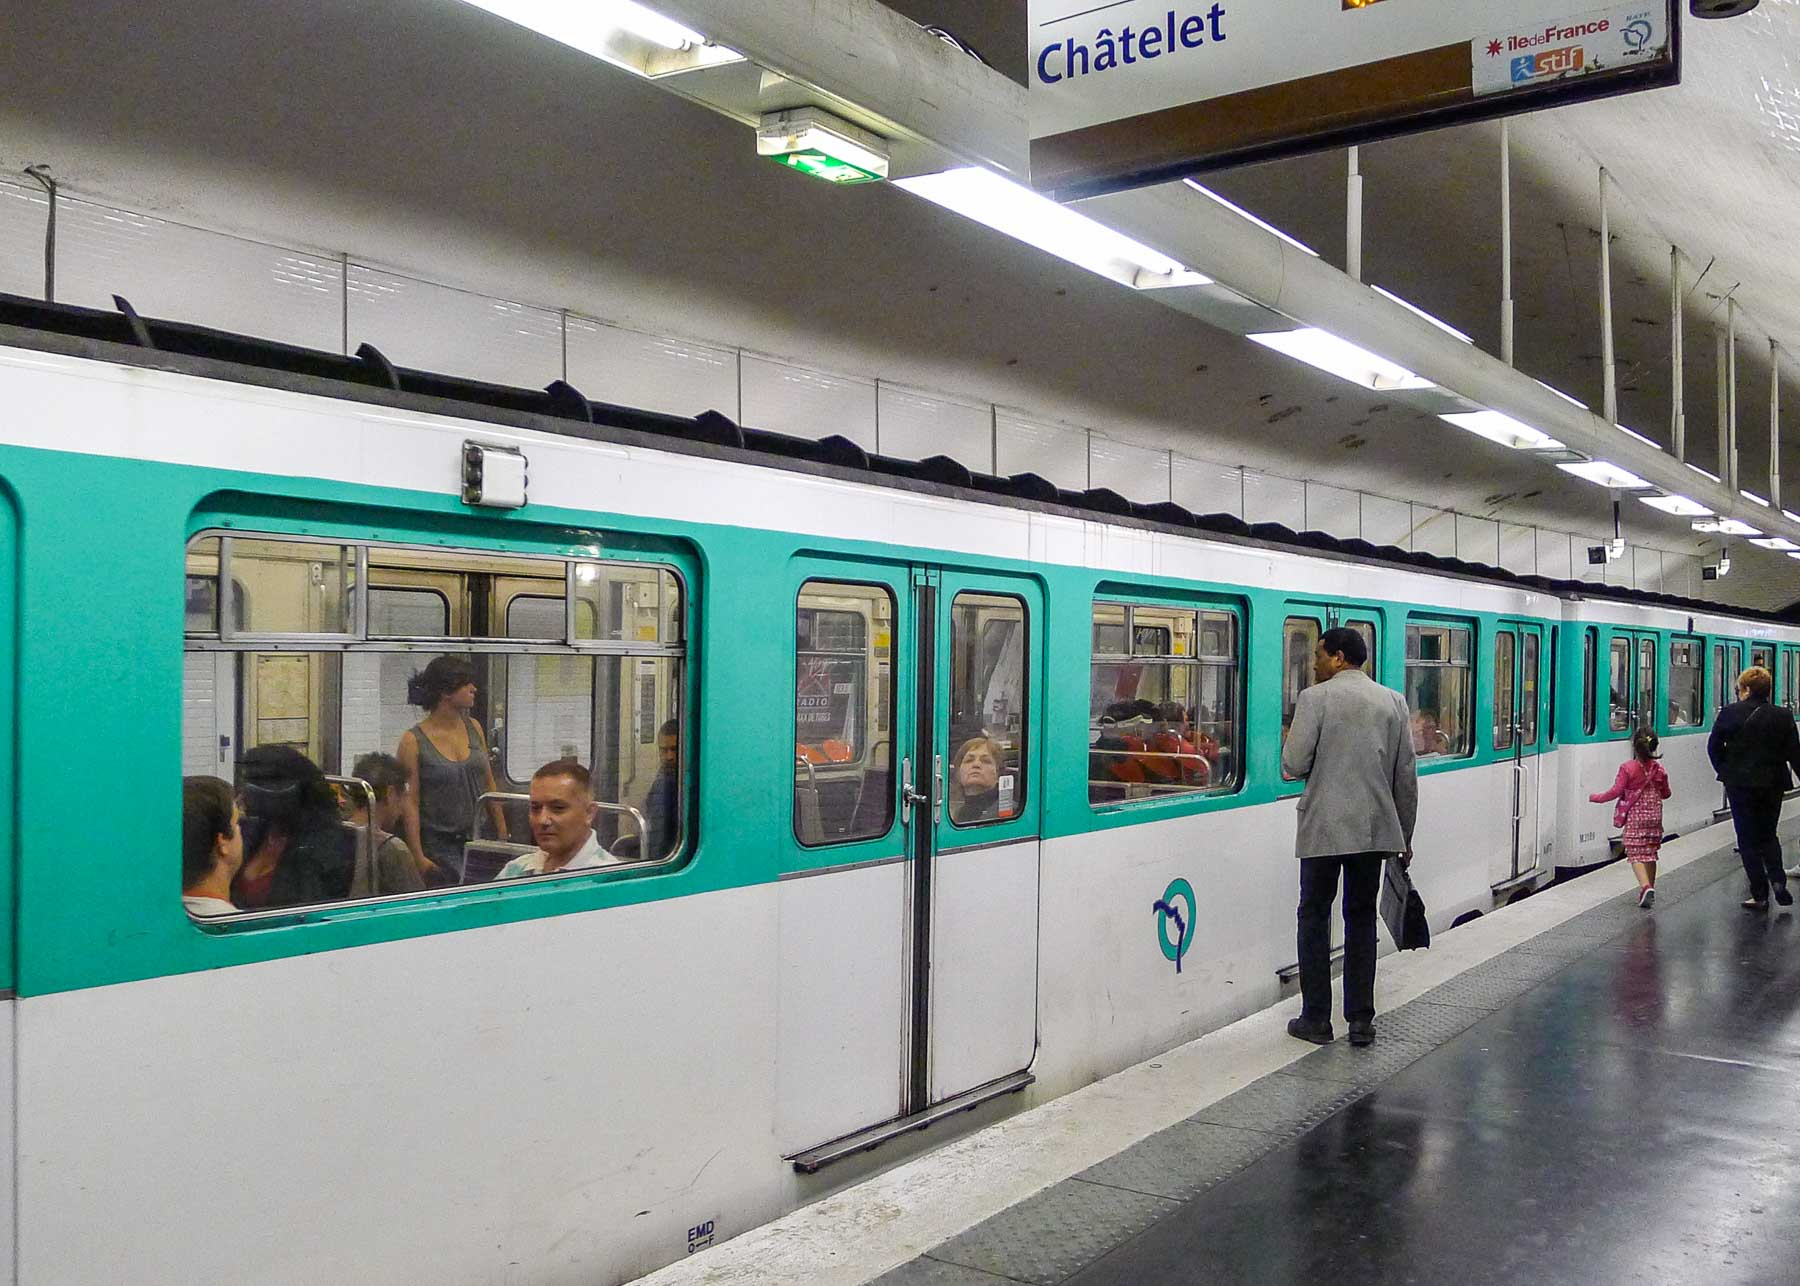 Metro train in station